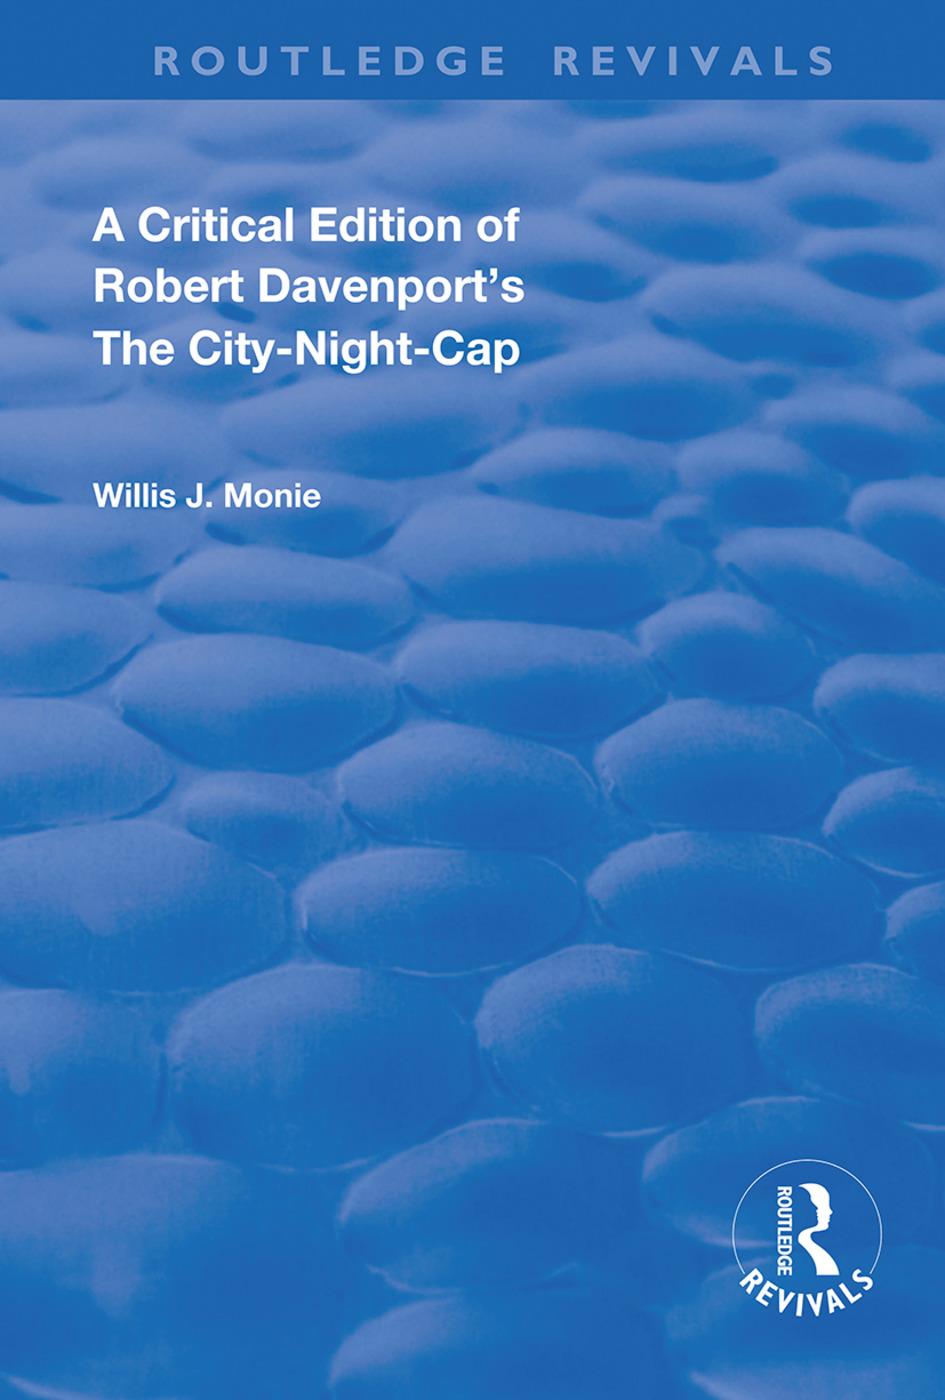 A Critical Edition of Robert Davenport's The City Night-Cap book cover